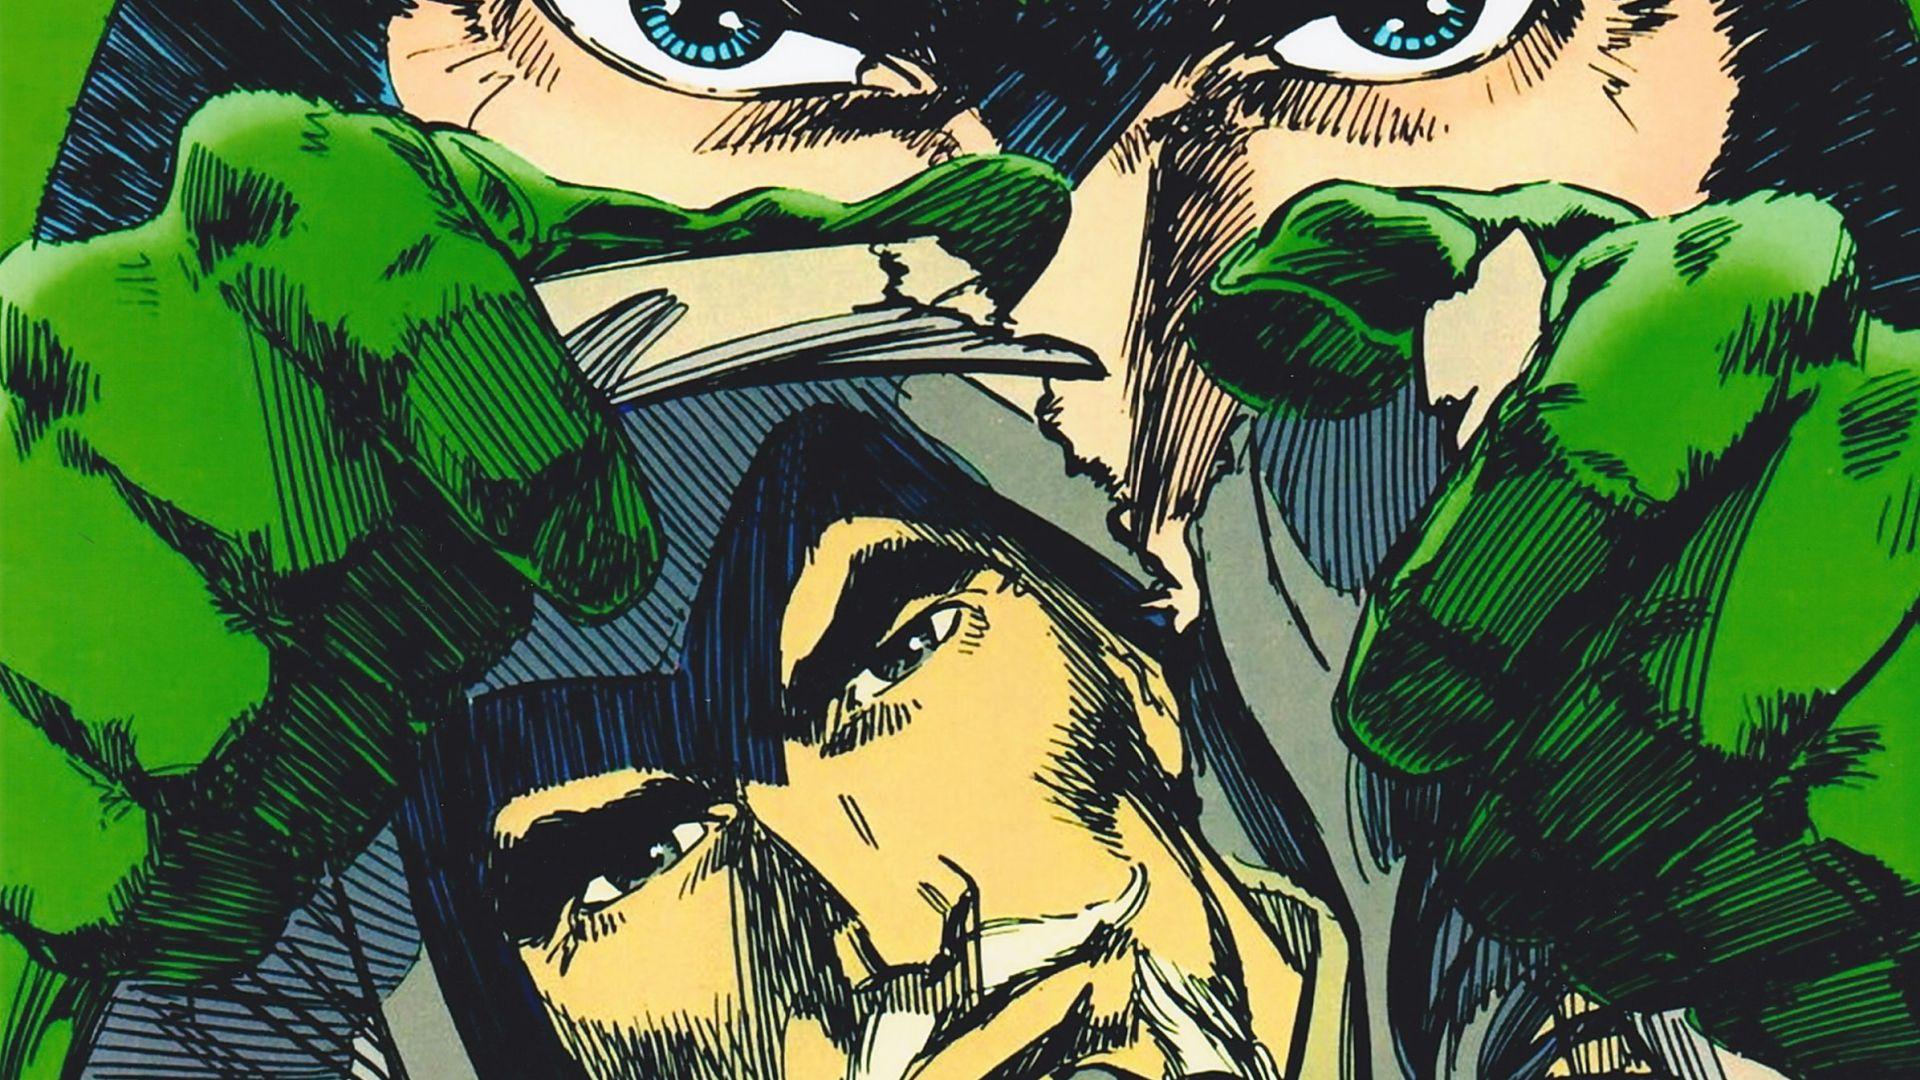 Superhero, green arrow, dc comics